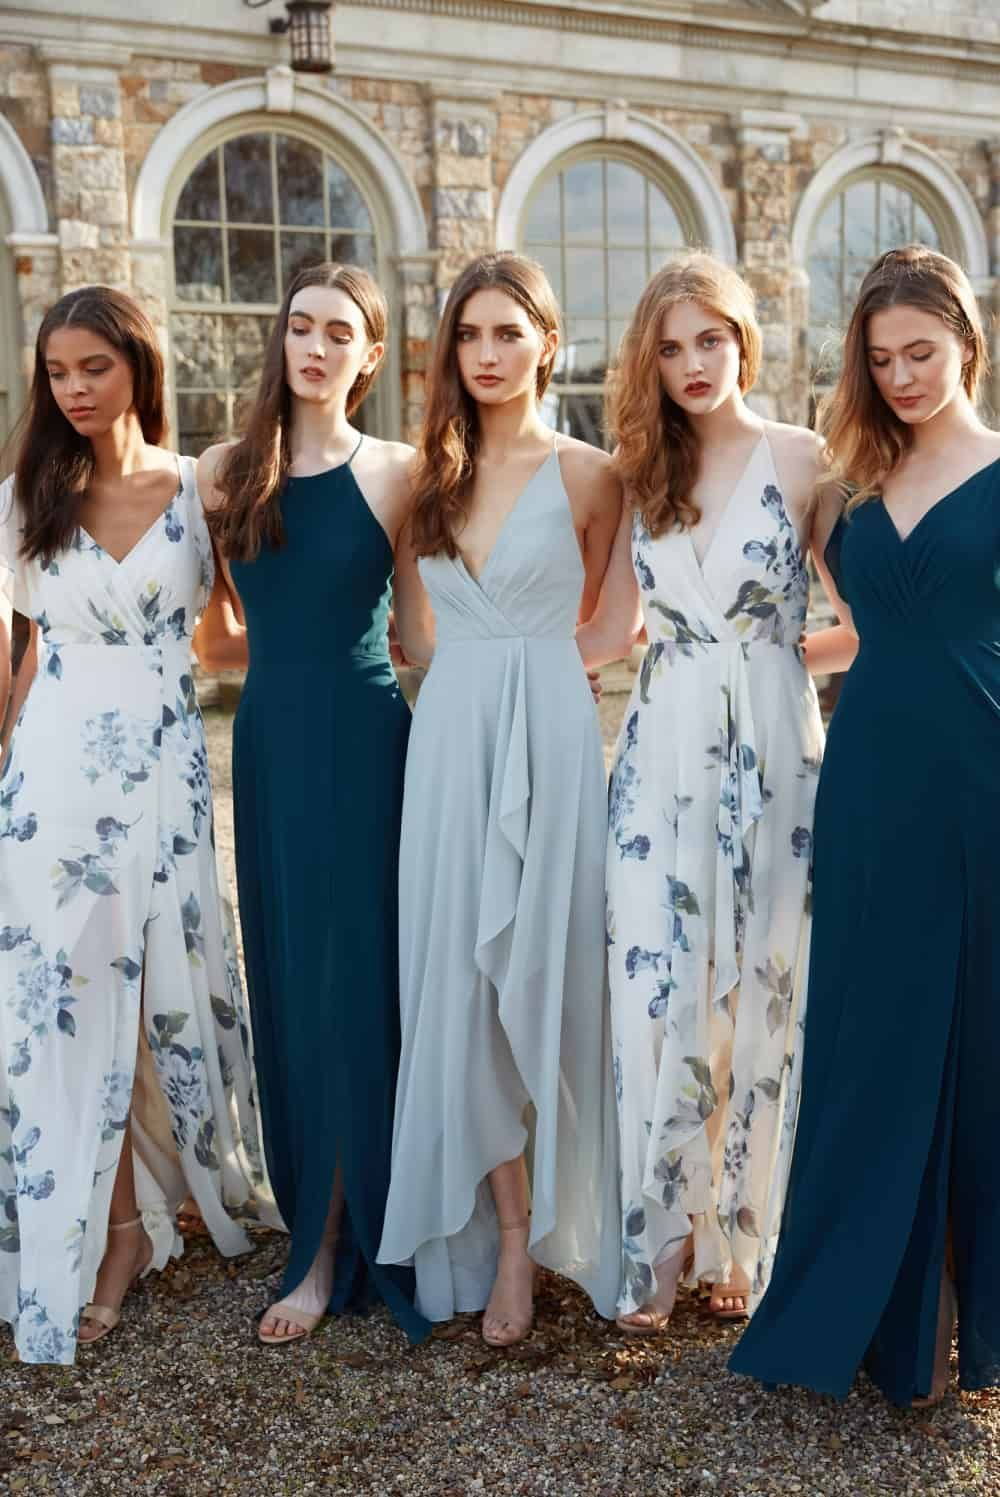 Floral print wedding dresses  Jenny Yoo Collection Bridal and Bridesmaid Dresses   wedding